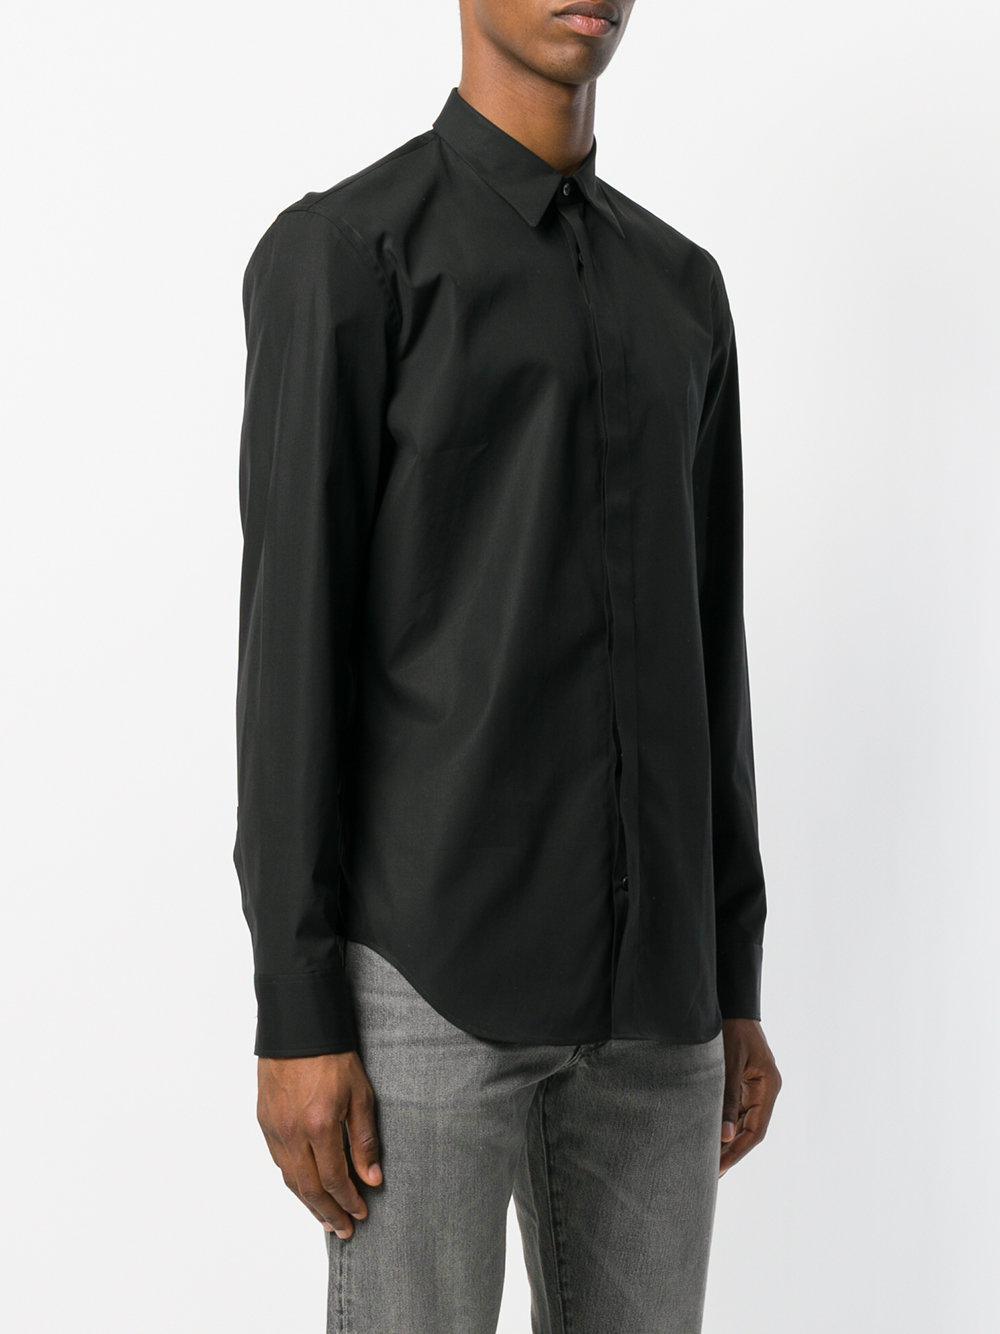 Maison Margiela Cotton Formal Fitted Shirt in Black for Men